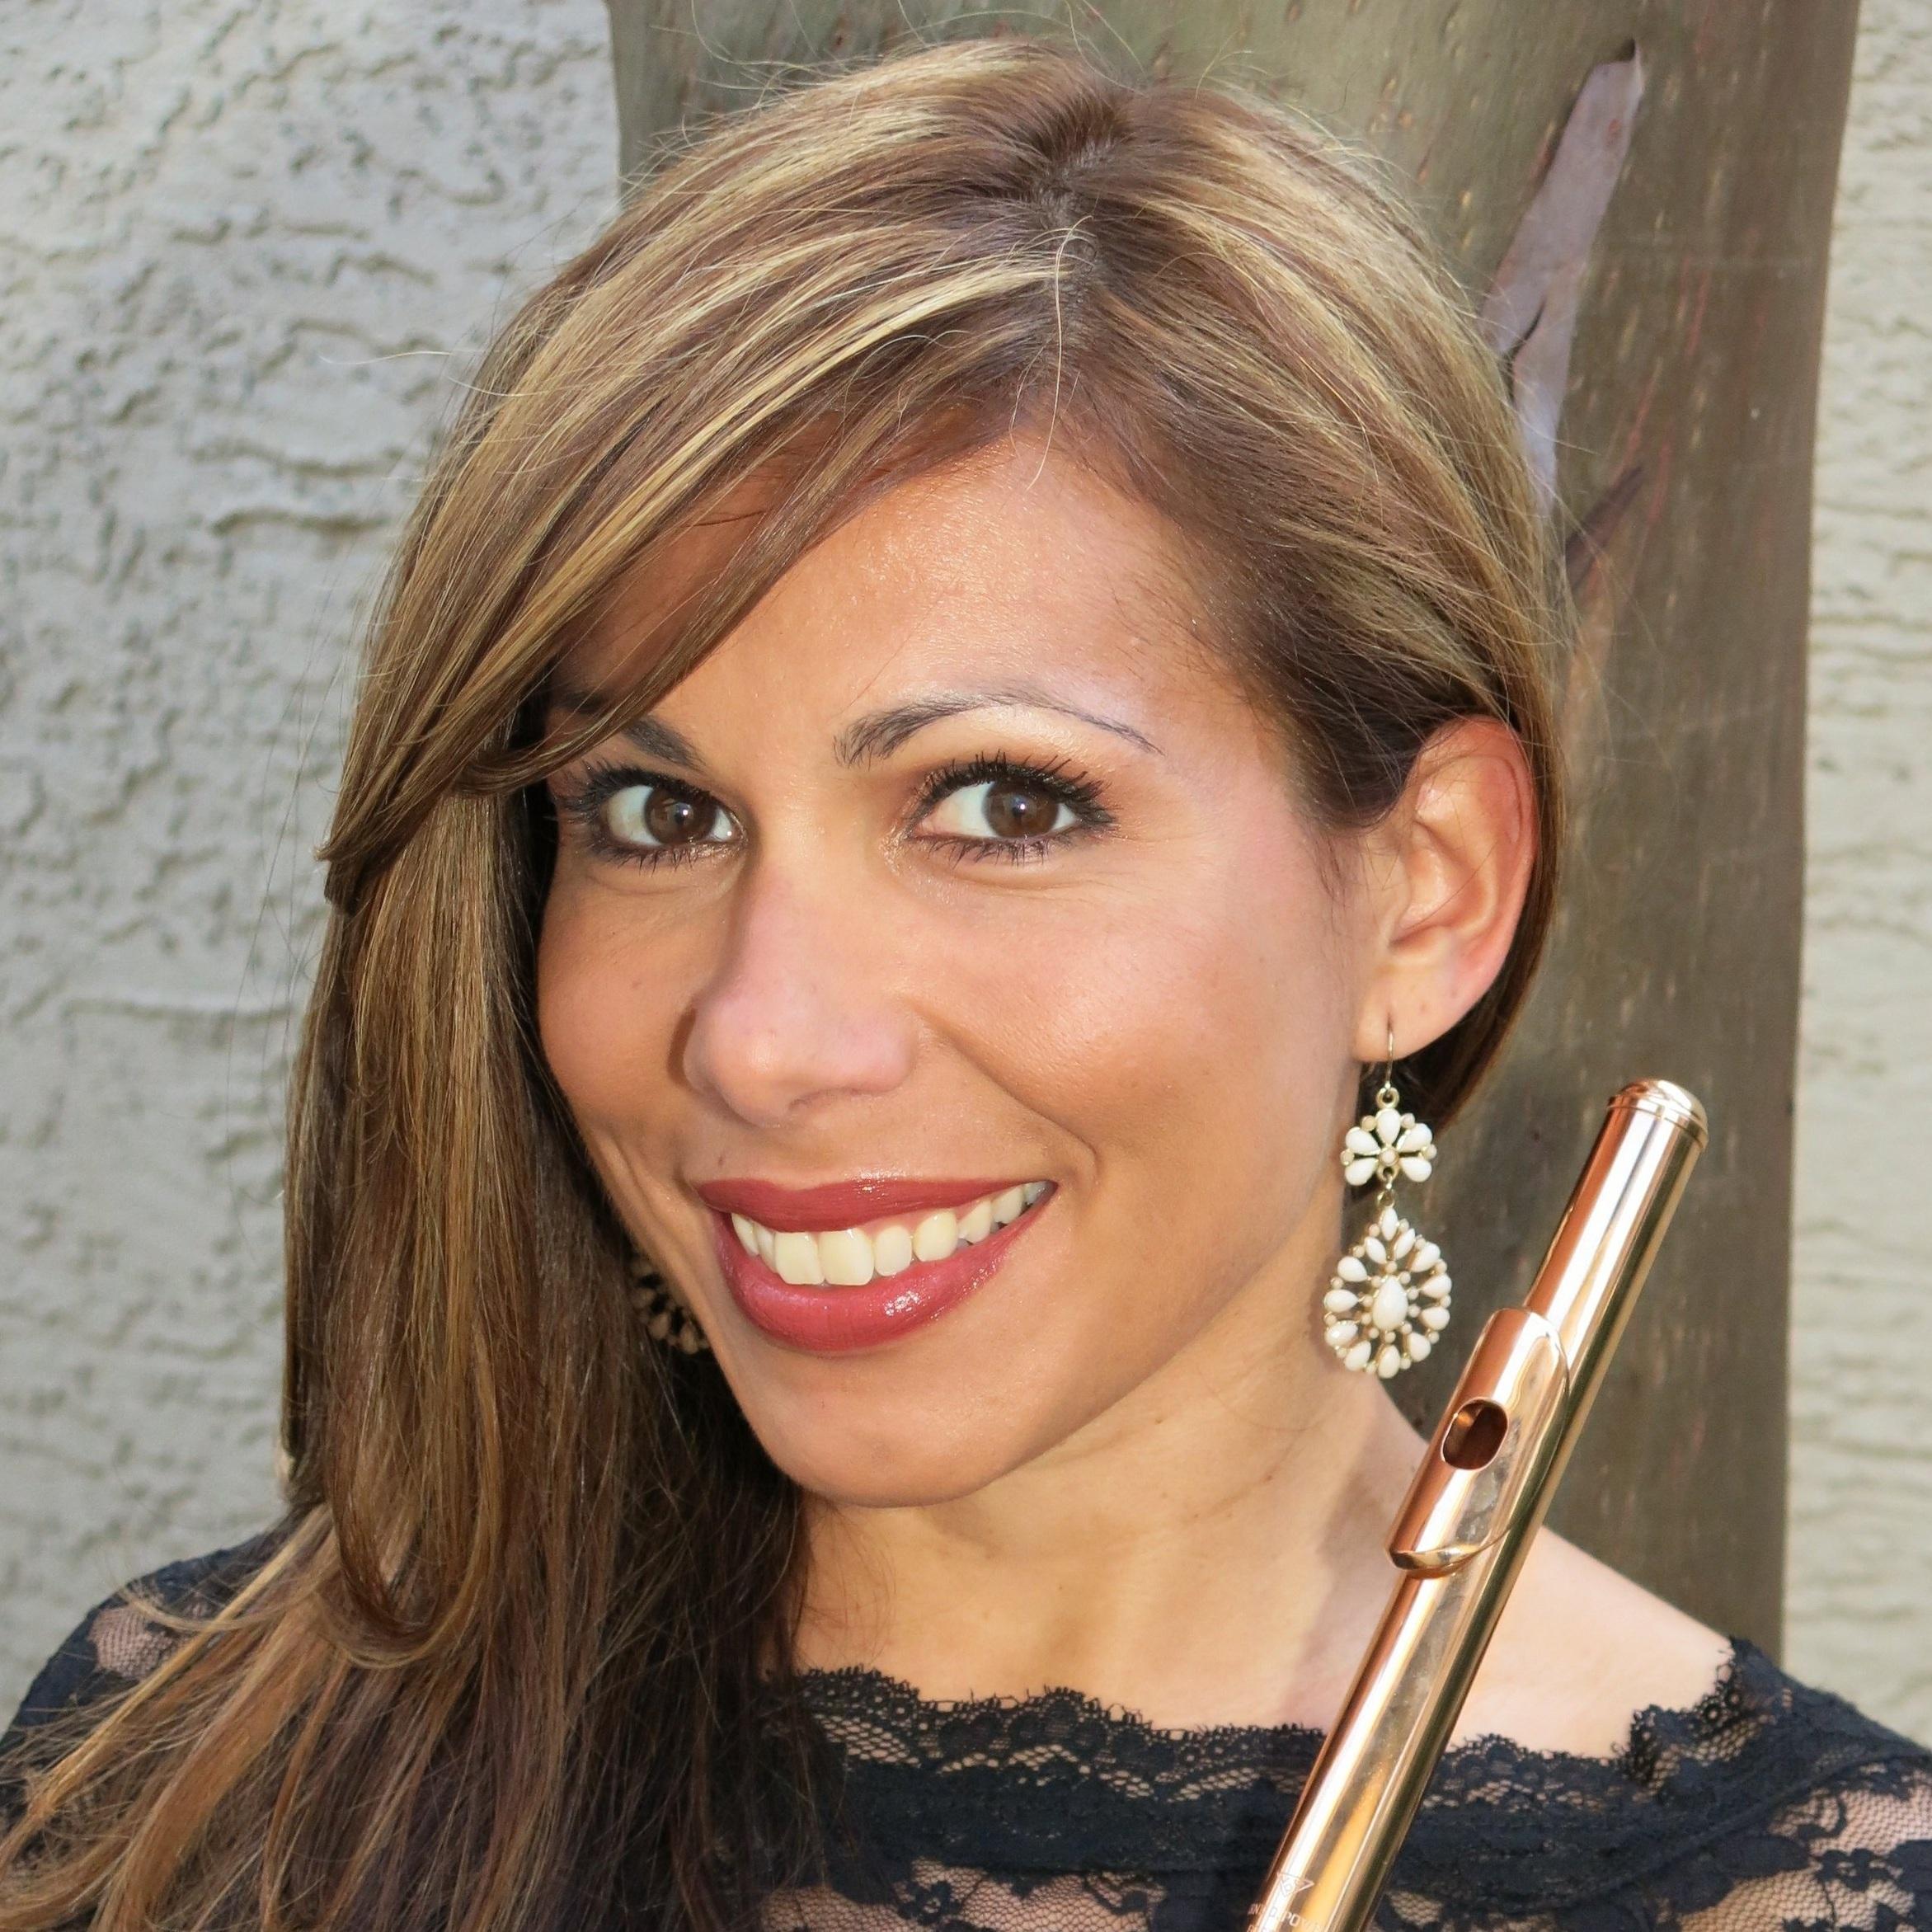 Viviana Cumplido Wilson, Flute